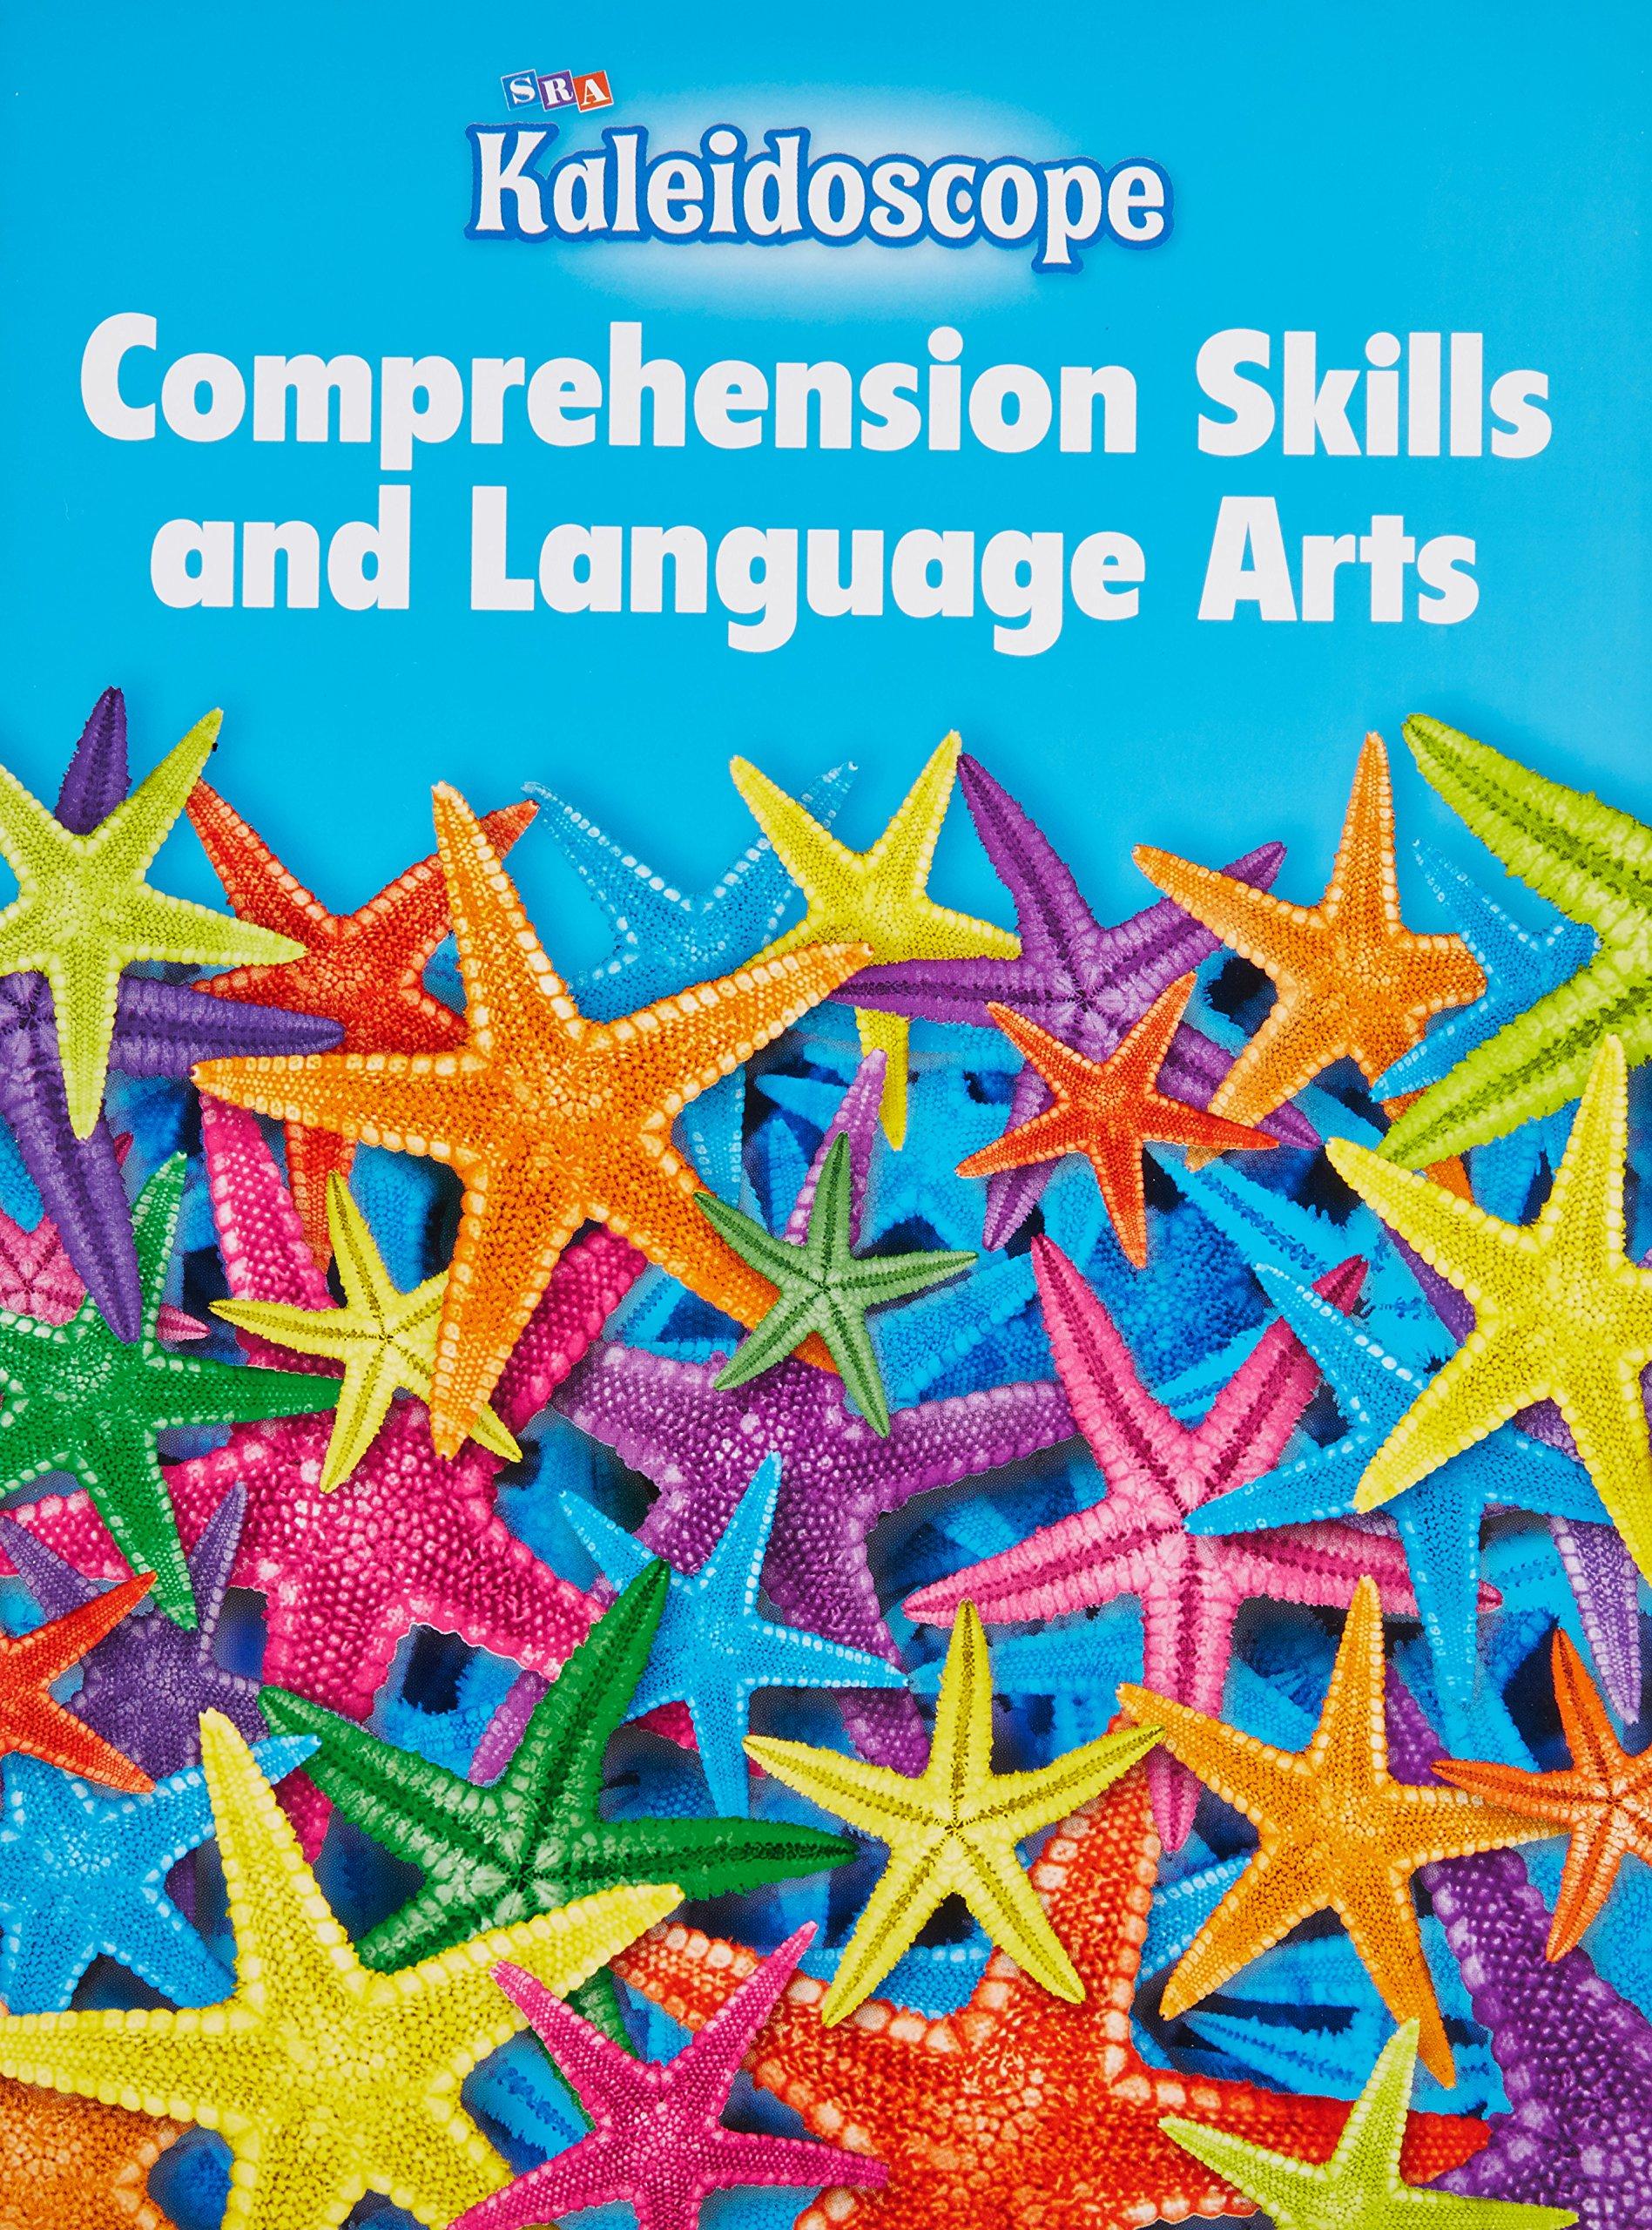 Download Kaleidoscope, Comprehension Skills and Language Arts Workbook, Level C PDF Text fb2 ebook